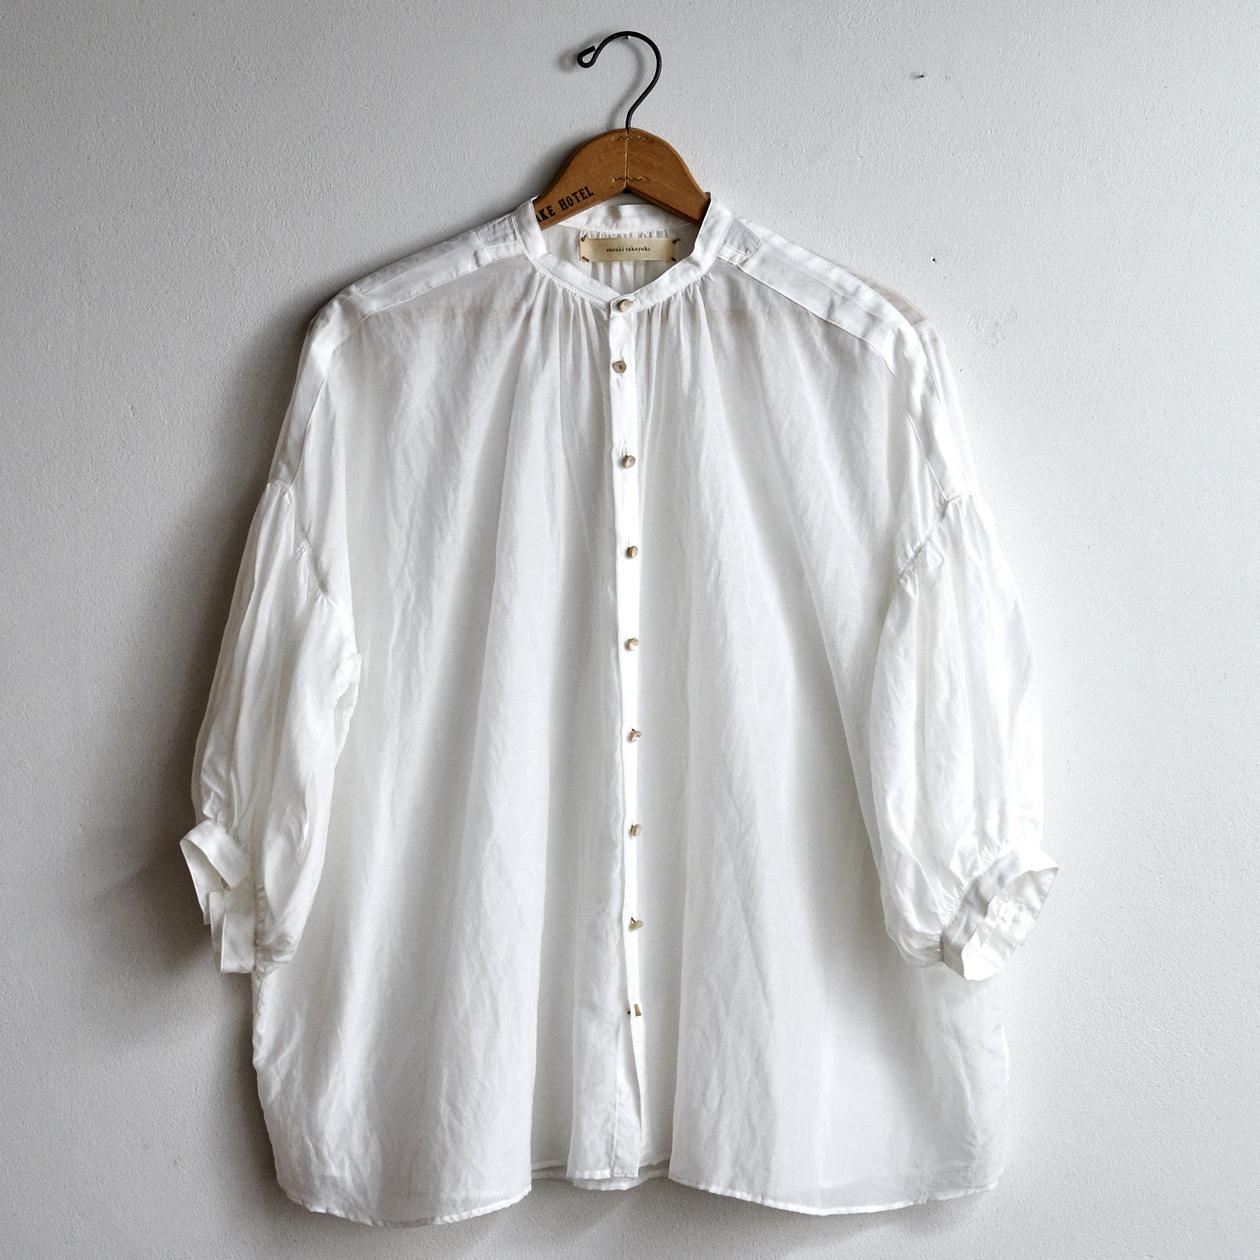 suzuki takayuki スズキタカユキ puff-sleeve blouse nude S211-13 (レディース)